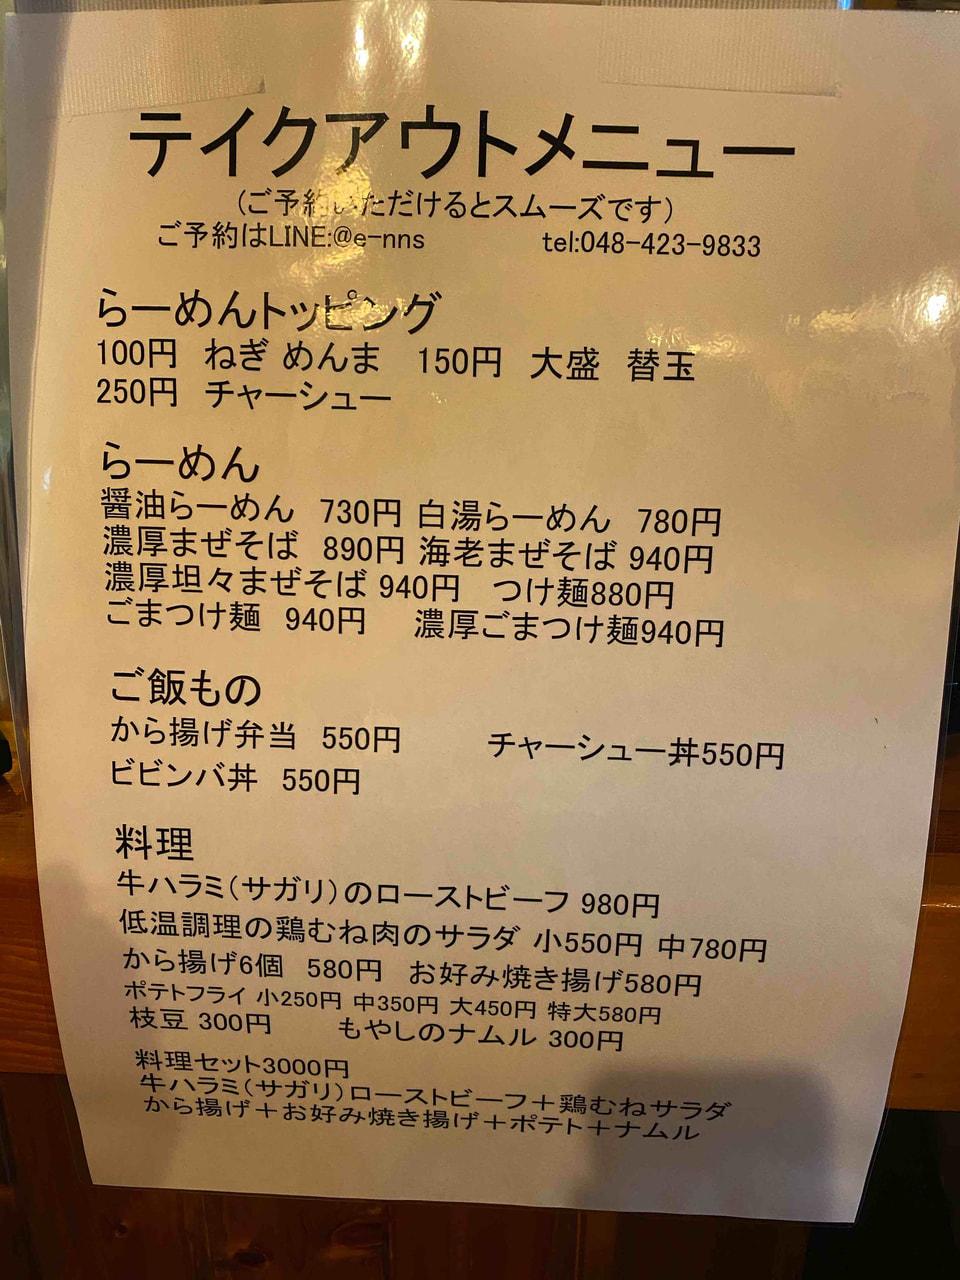 Freestyle Dining E-nNS (エン)(朝霞市)のテイクアウトできるお弁当